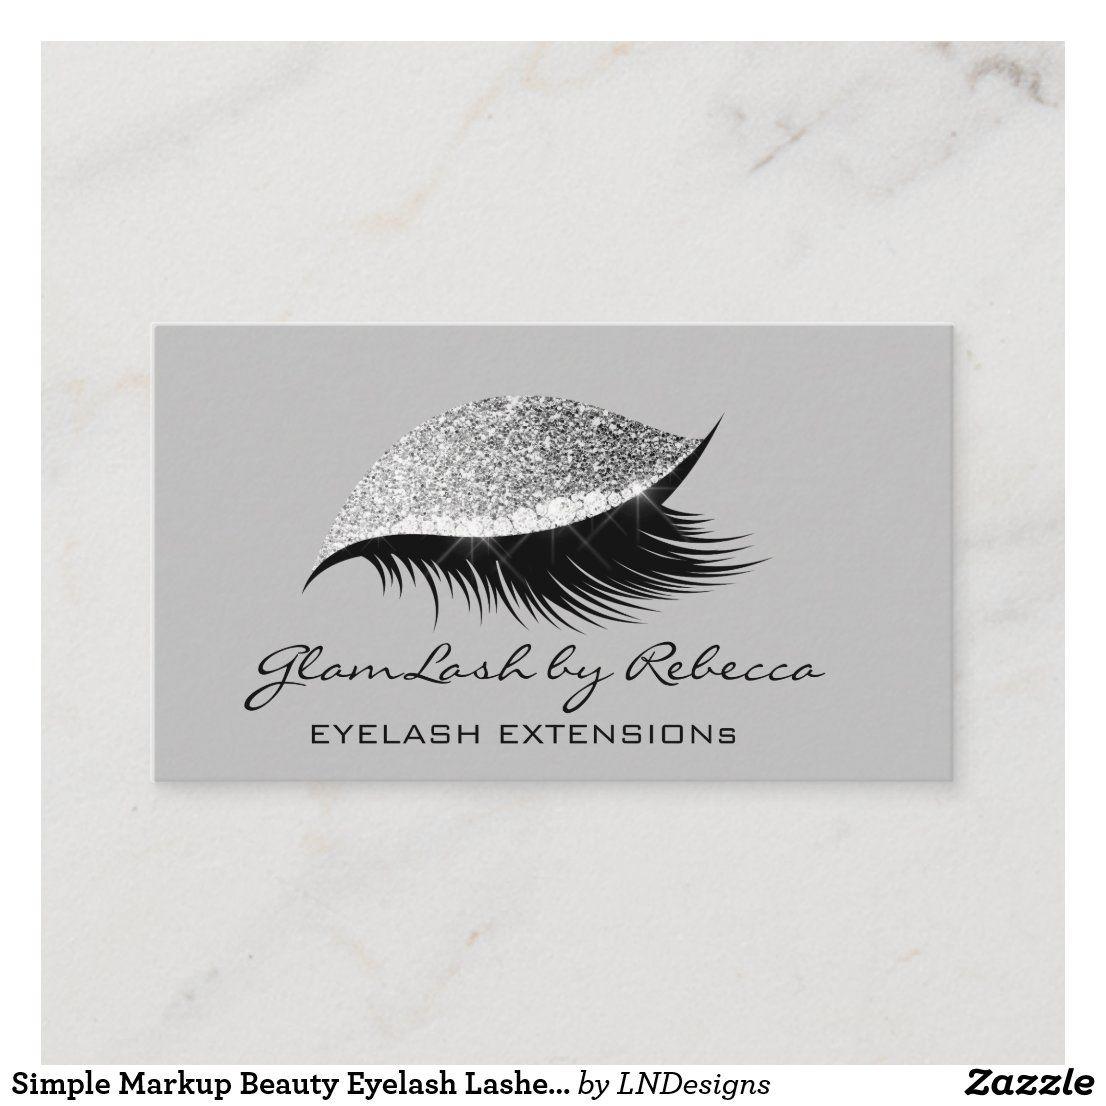 Simple Makeup Beauty Eyelash Lashes Glitter Silver Business Card   Zazzle.com